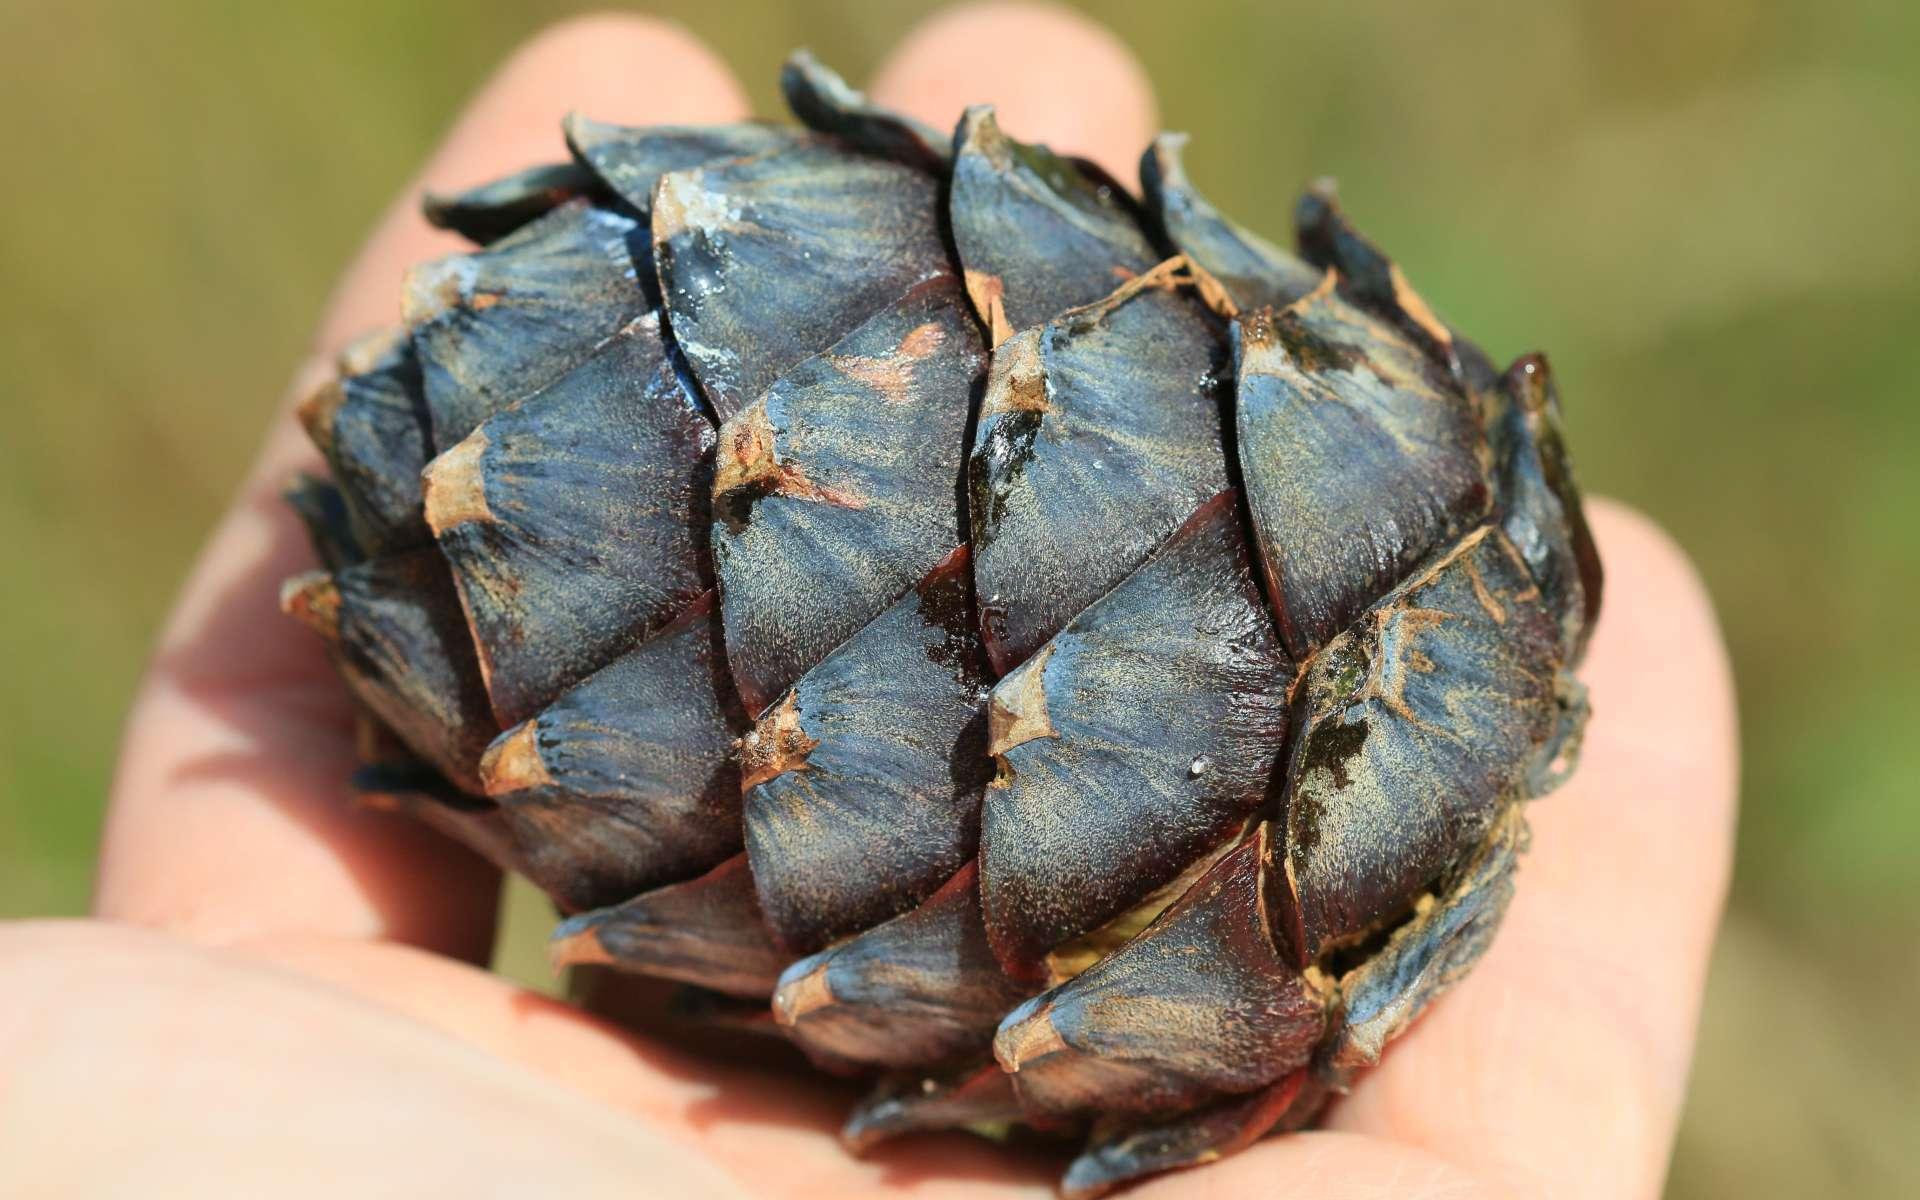 Pin cembro - cône (Crédits : S. Rae - Flickr)